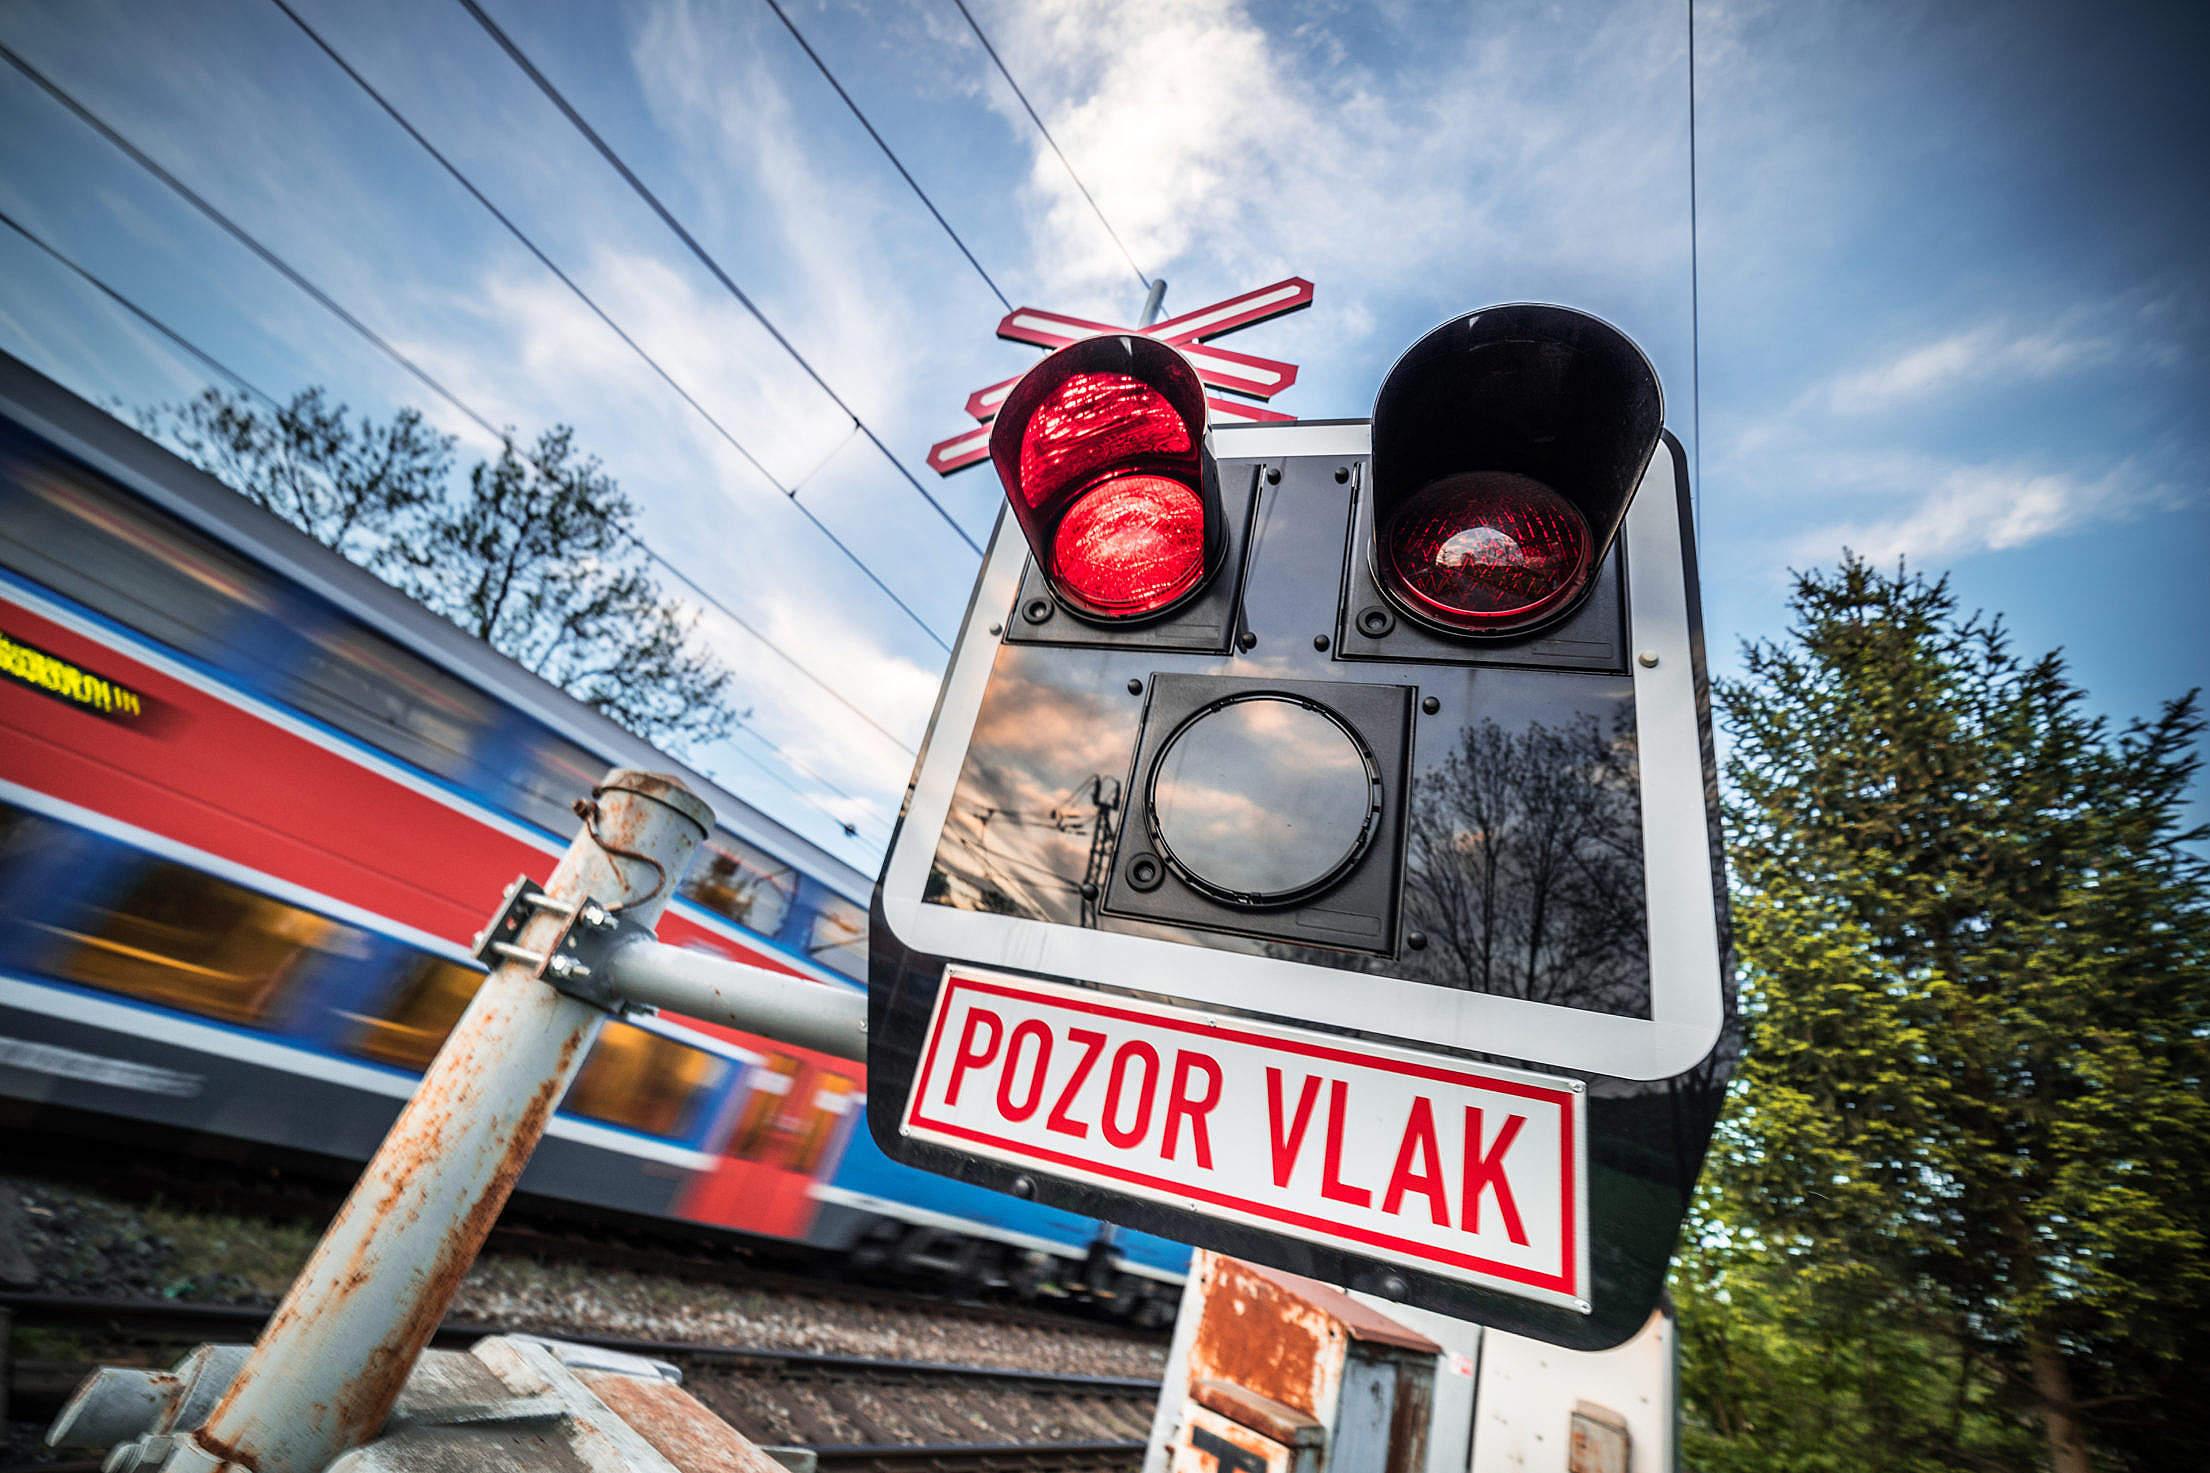 Pozor Vlak Czech Railway Crossing Sign Free Stock Photo